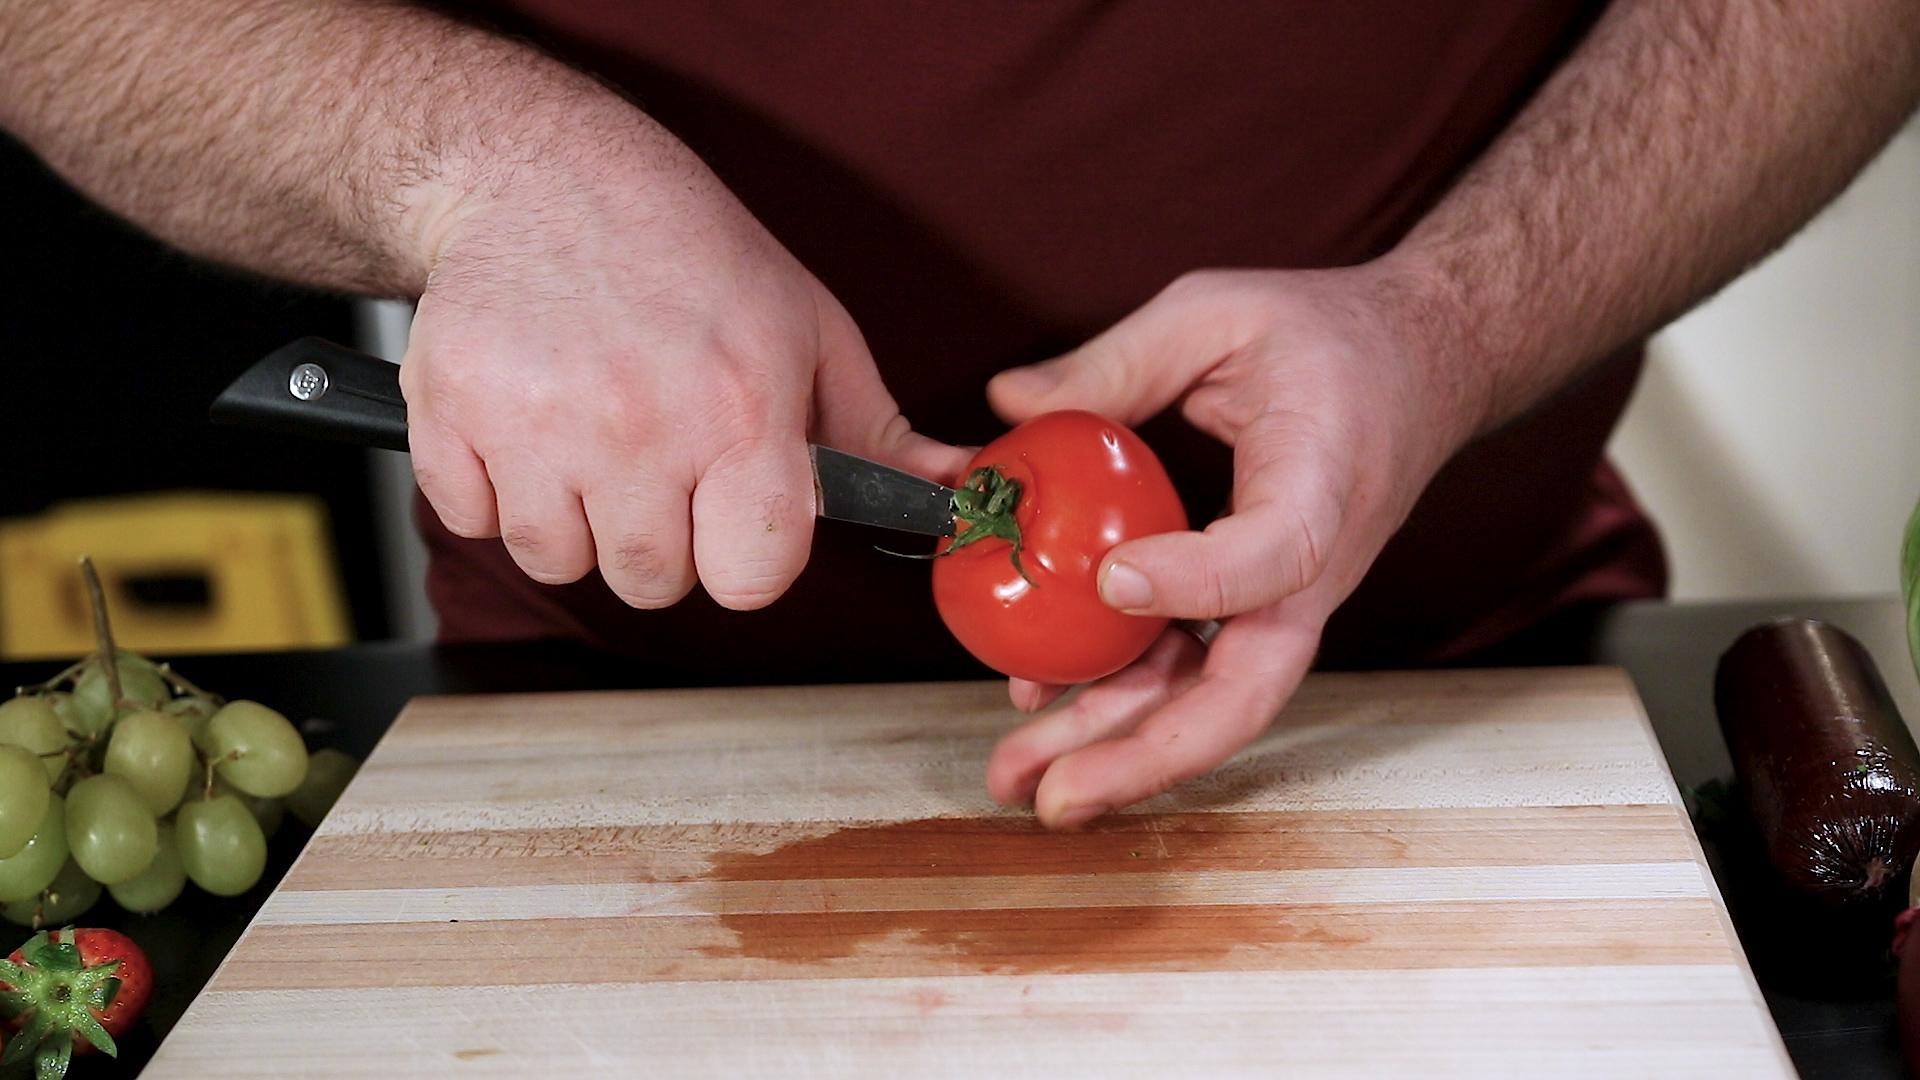 Shun Sora Paring Knife Trimming a Tomato